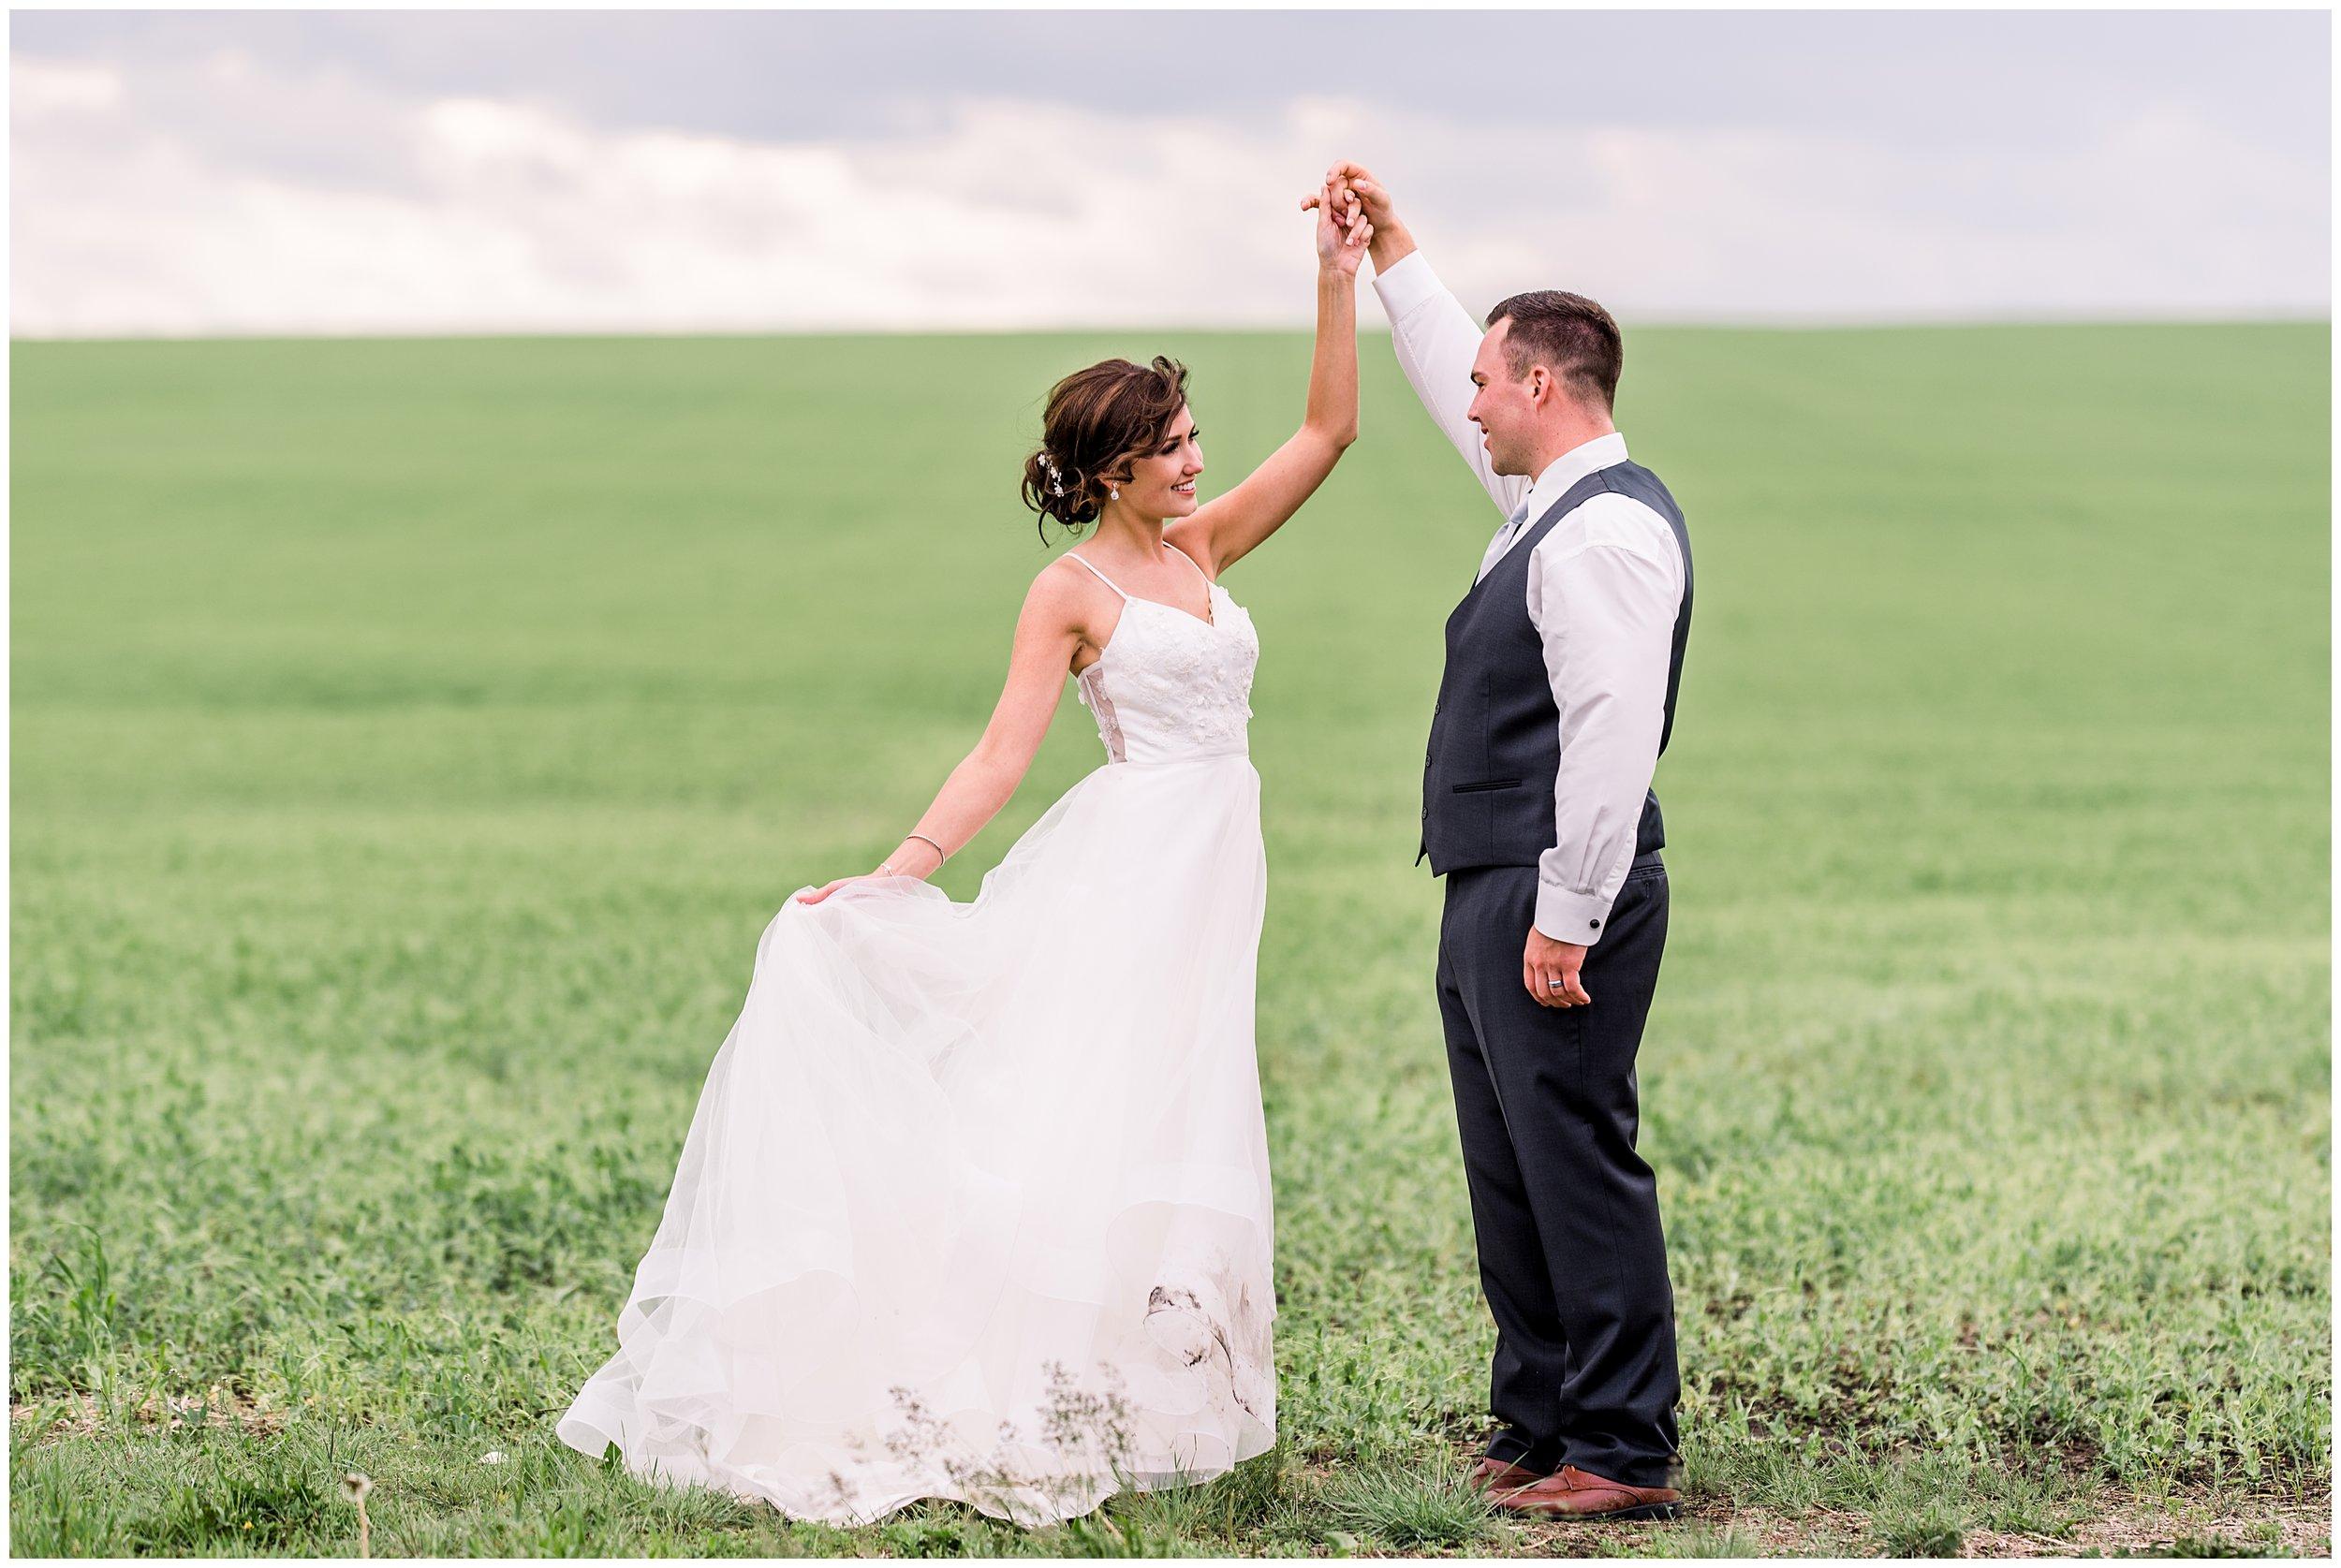 Alyssa-Poland-Photography_0638_alberta wedding.jpg